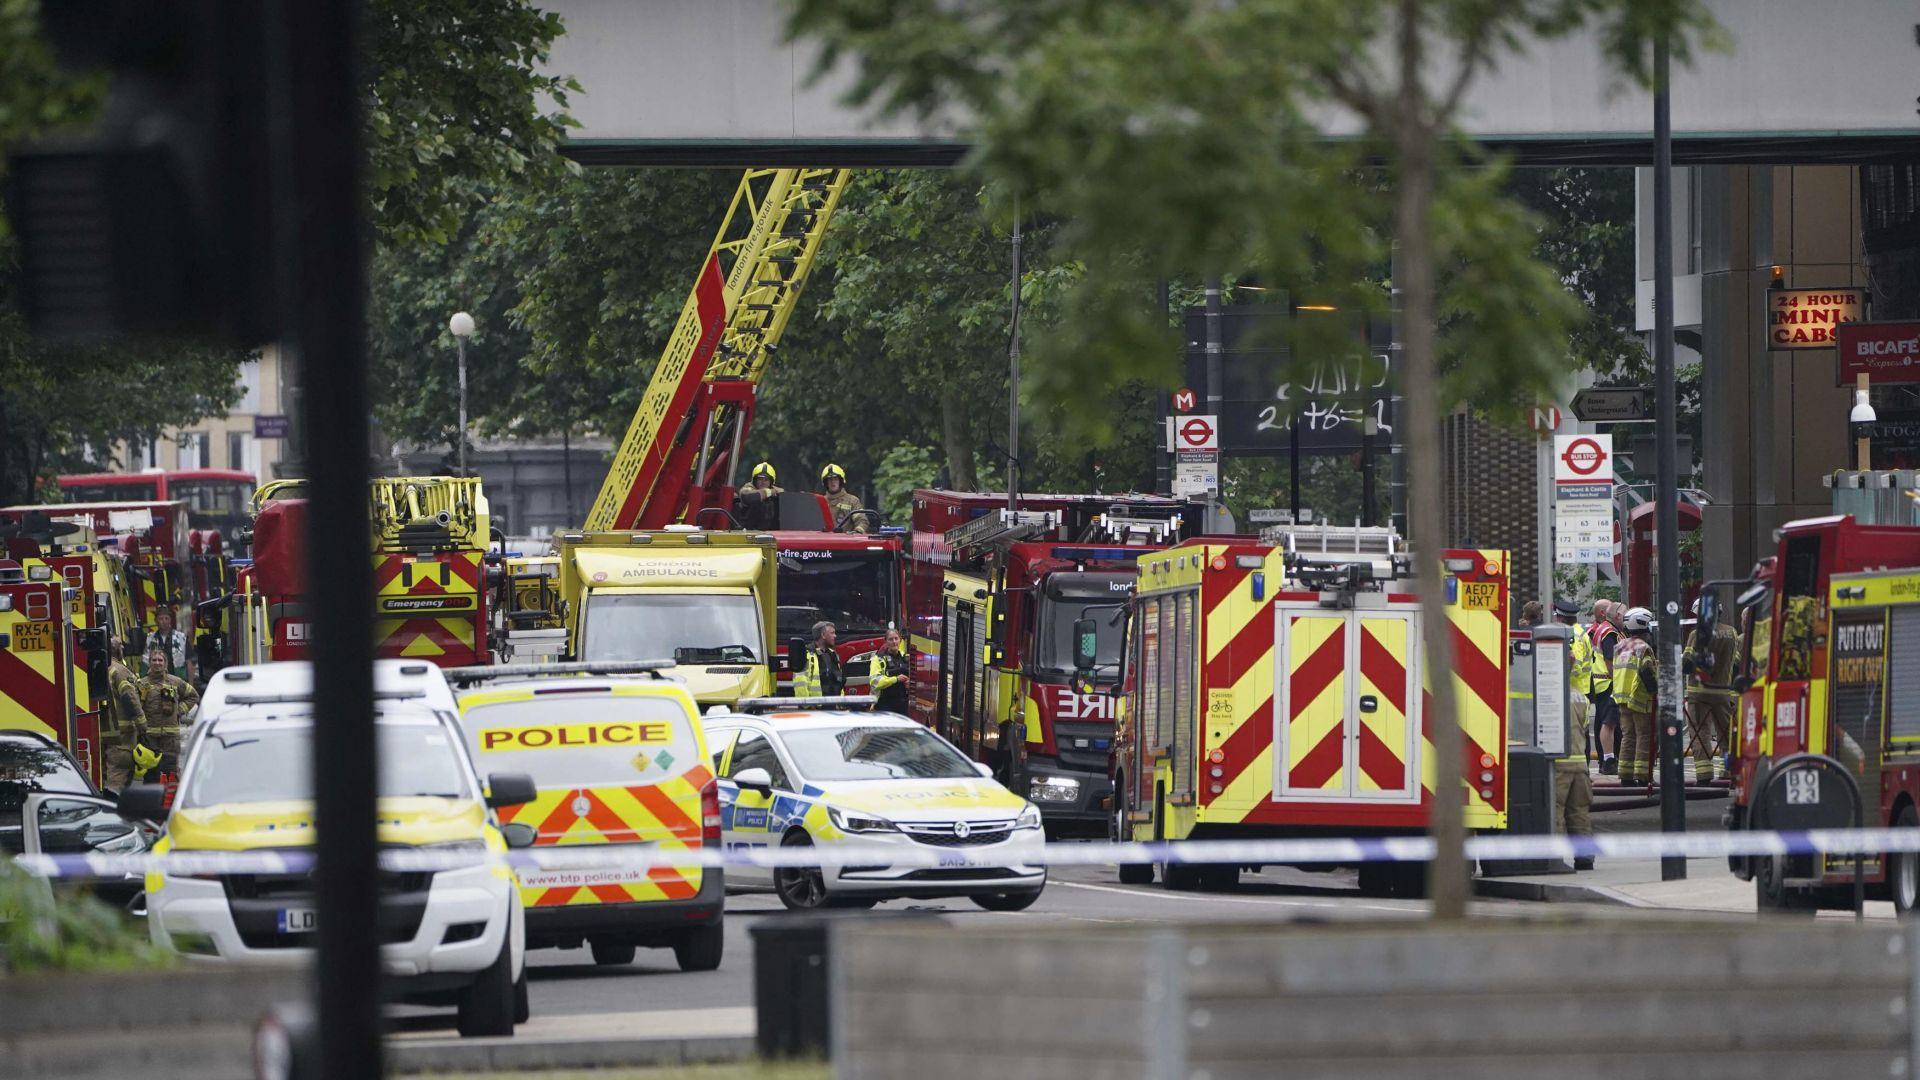 Огромен пожар избухна в близост до метростанция в Лондон (снимки/видео)